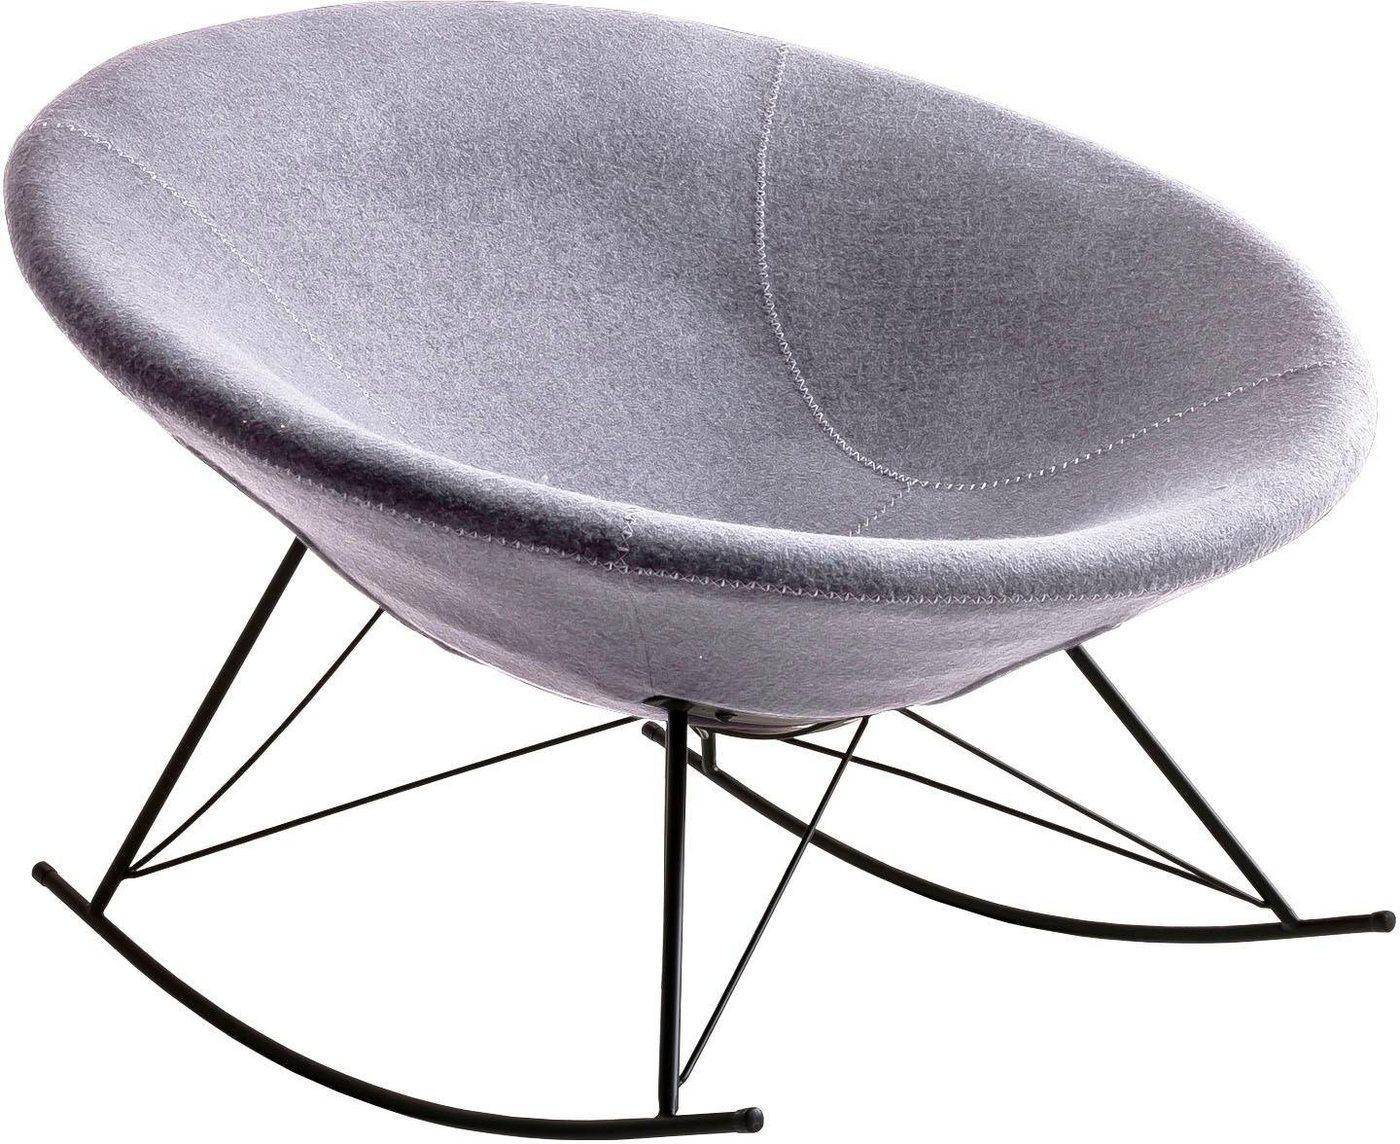 Schaukelsessel modern mit Schalensitz & Lounge Charakter*